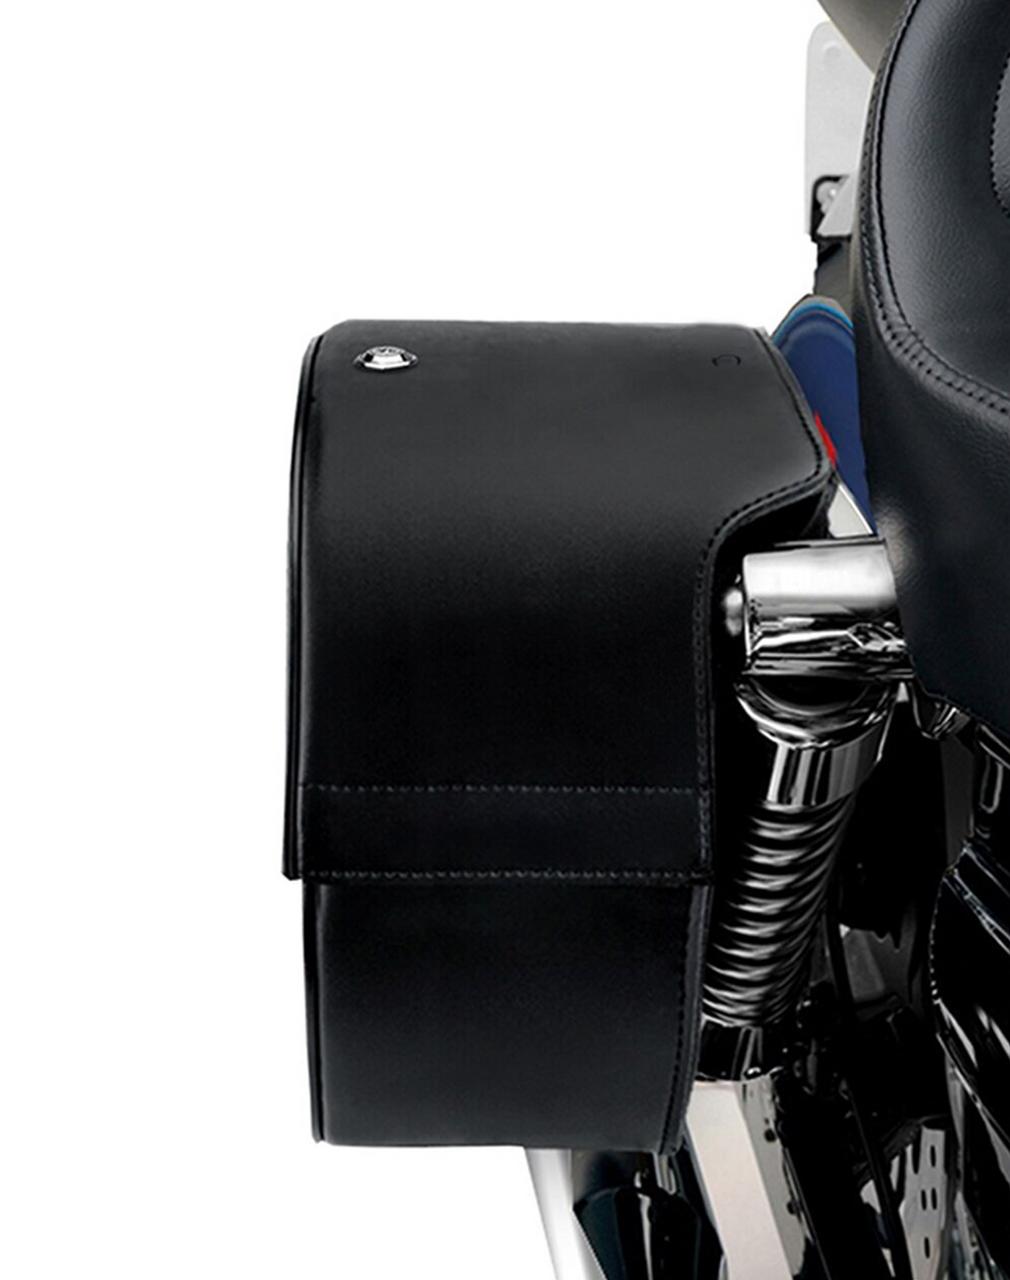 Honda Rebel 500 Shock Cutout Slanted Studded Large Motorcycle Saddlebags Key Lockable View